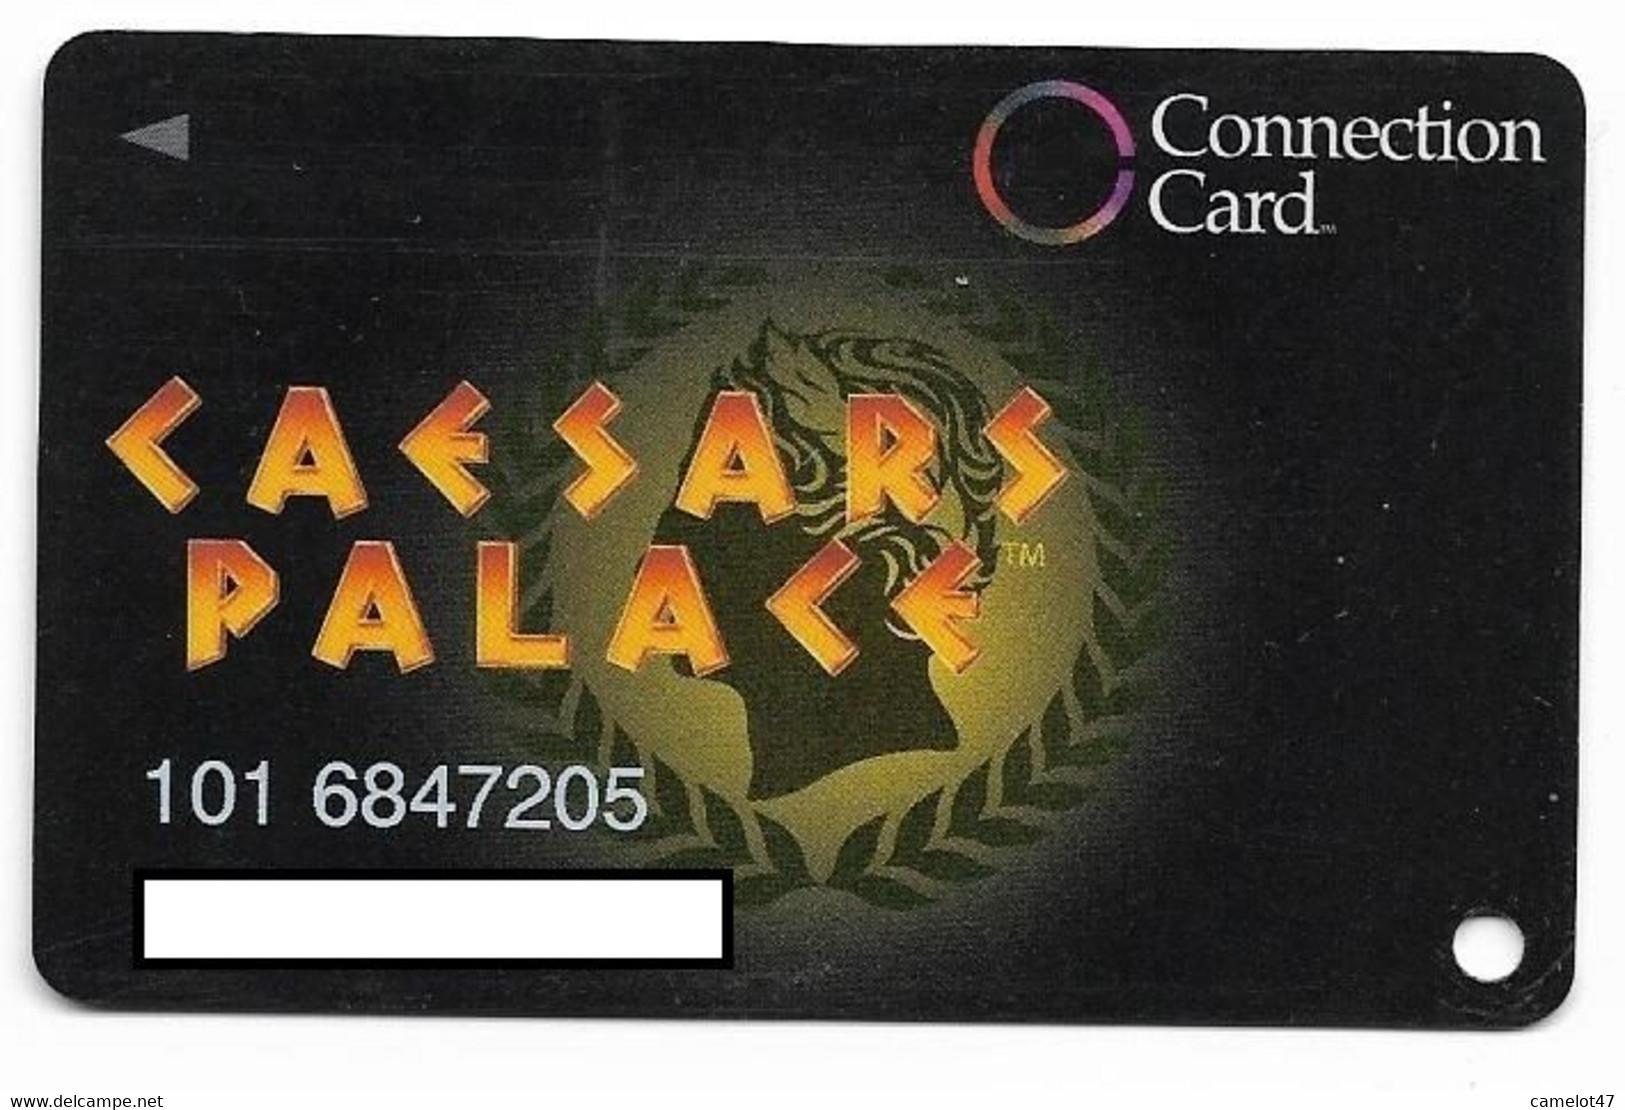 Caesars Palace Casino, Las Vegas, Older Used Slot Or Player's Card,  # Caesars-1 - Casino Cards